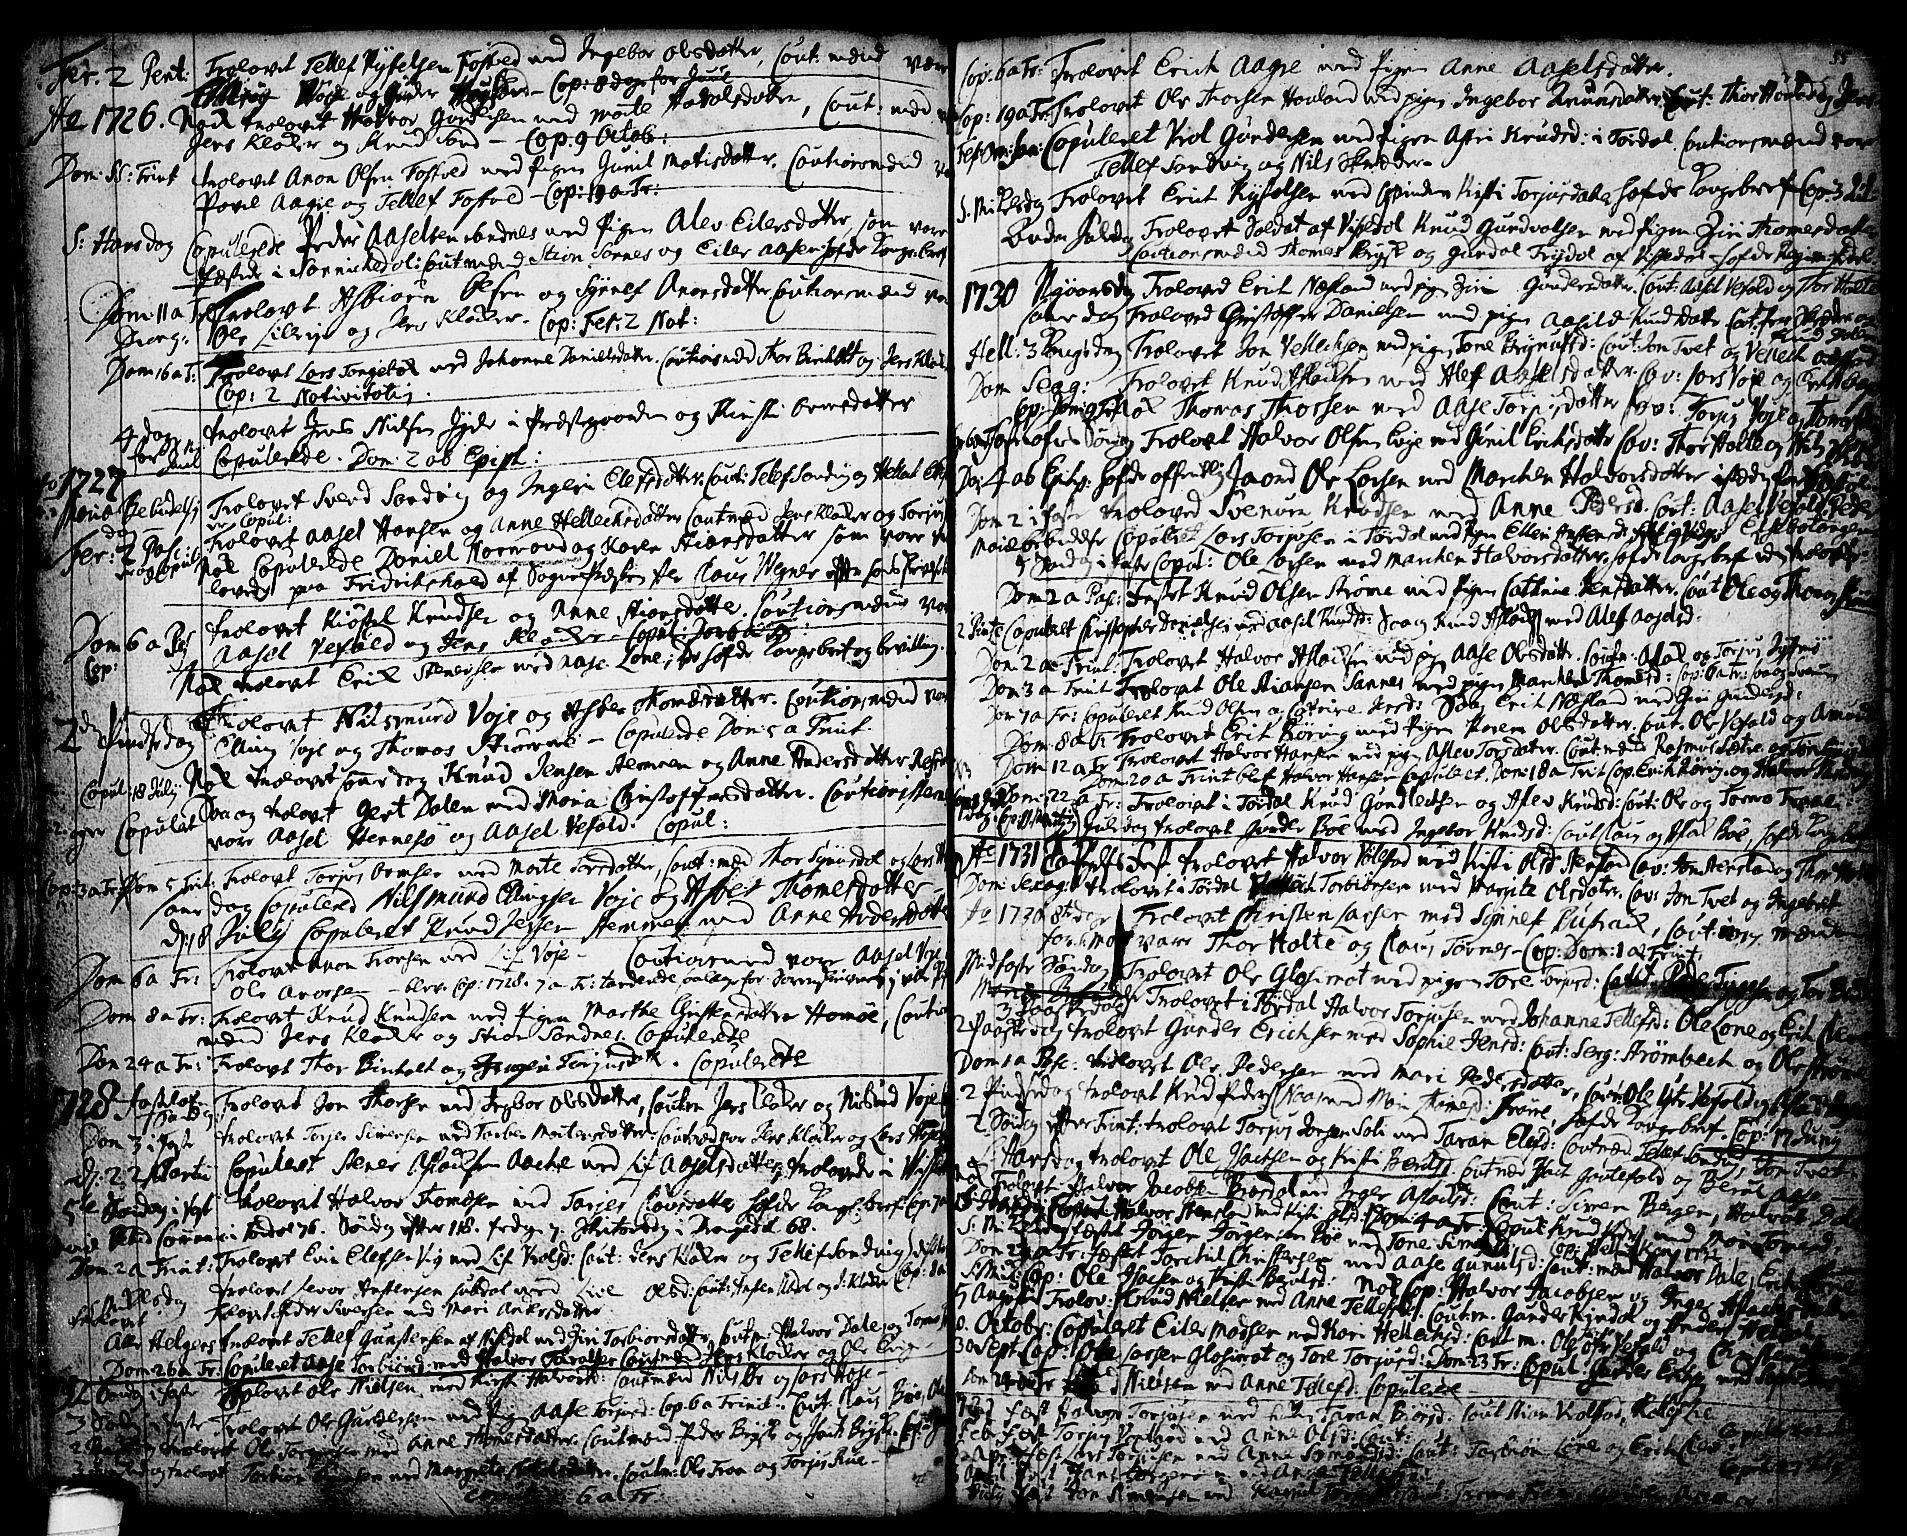 SAKO, Drangedal kirkebøker, F/Fa/L0001: Ministerialbok nr. 1, 1697-1767, s. 55